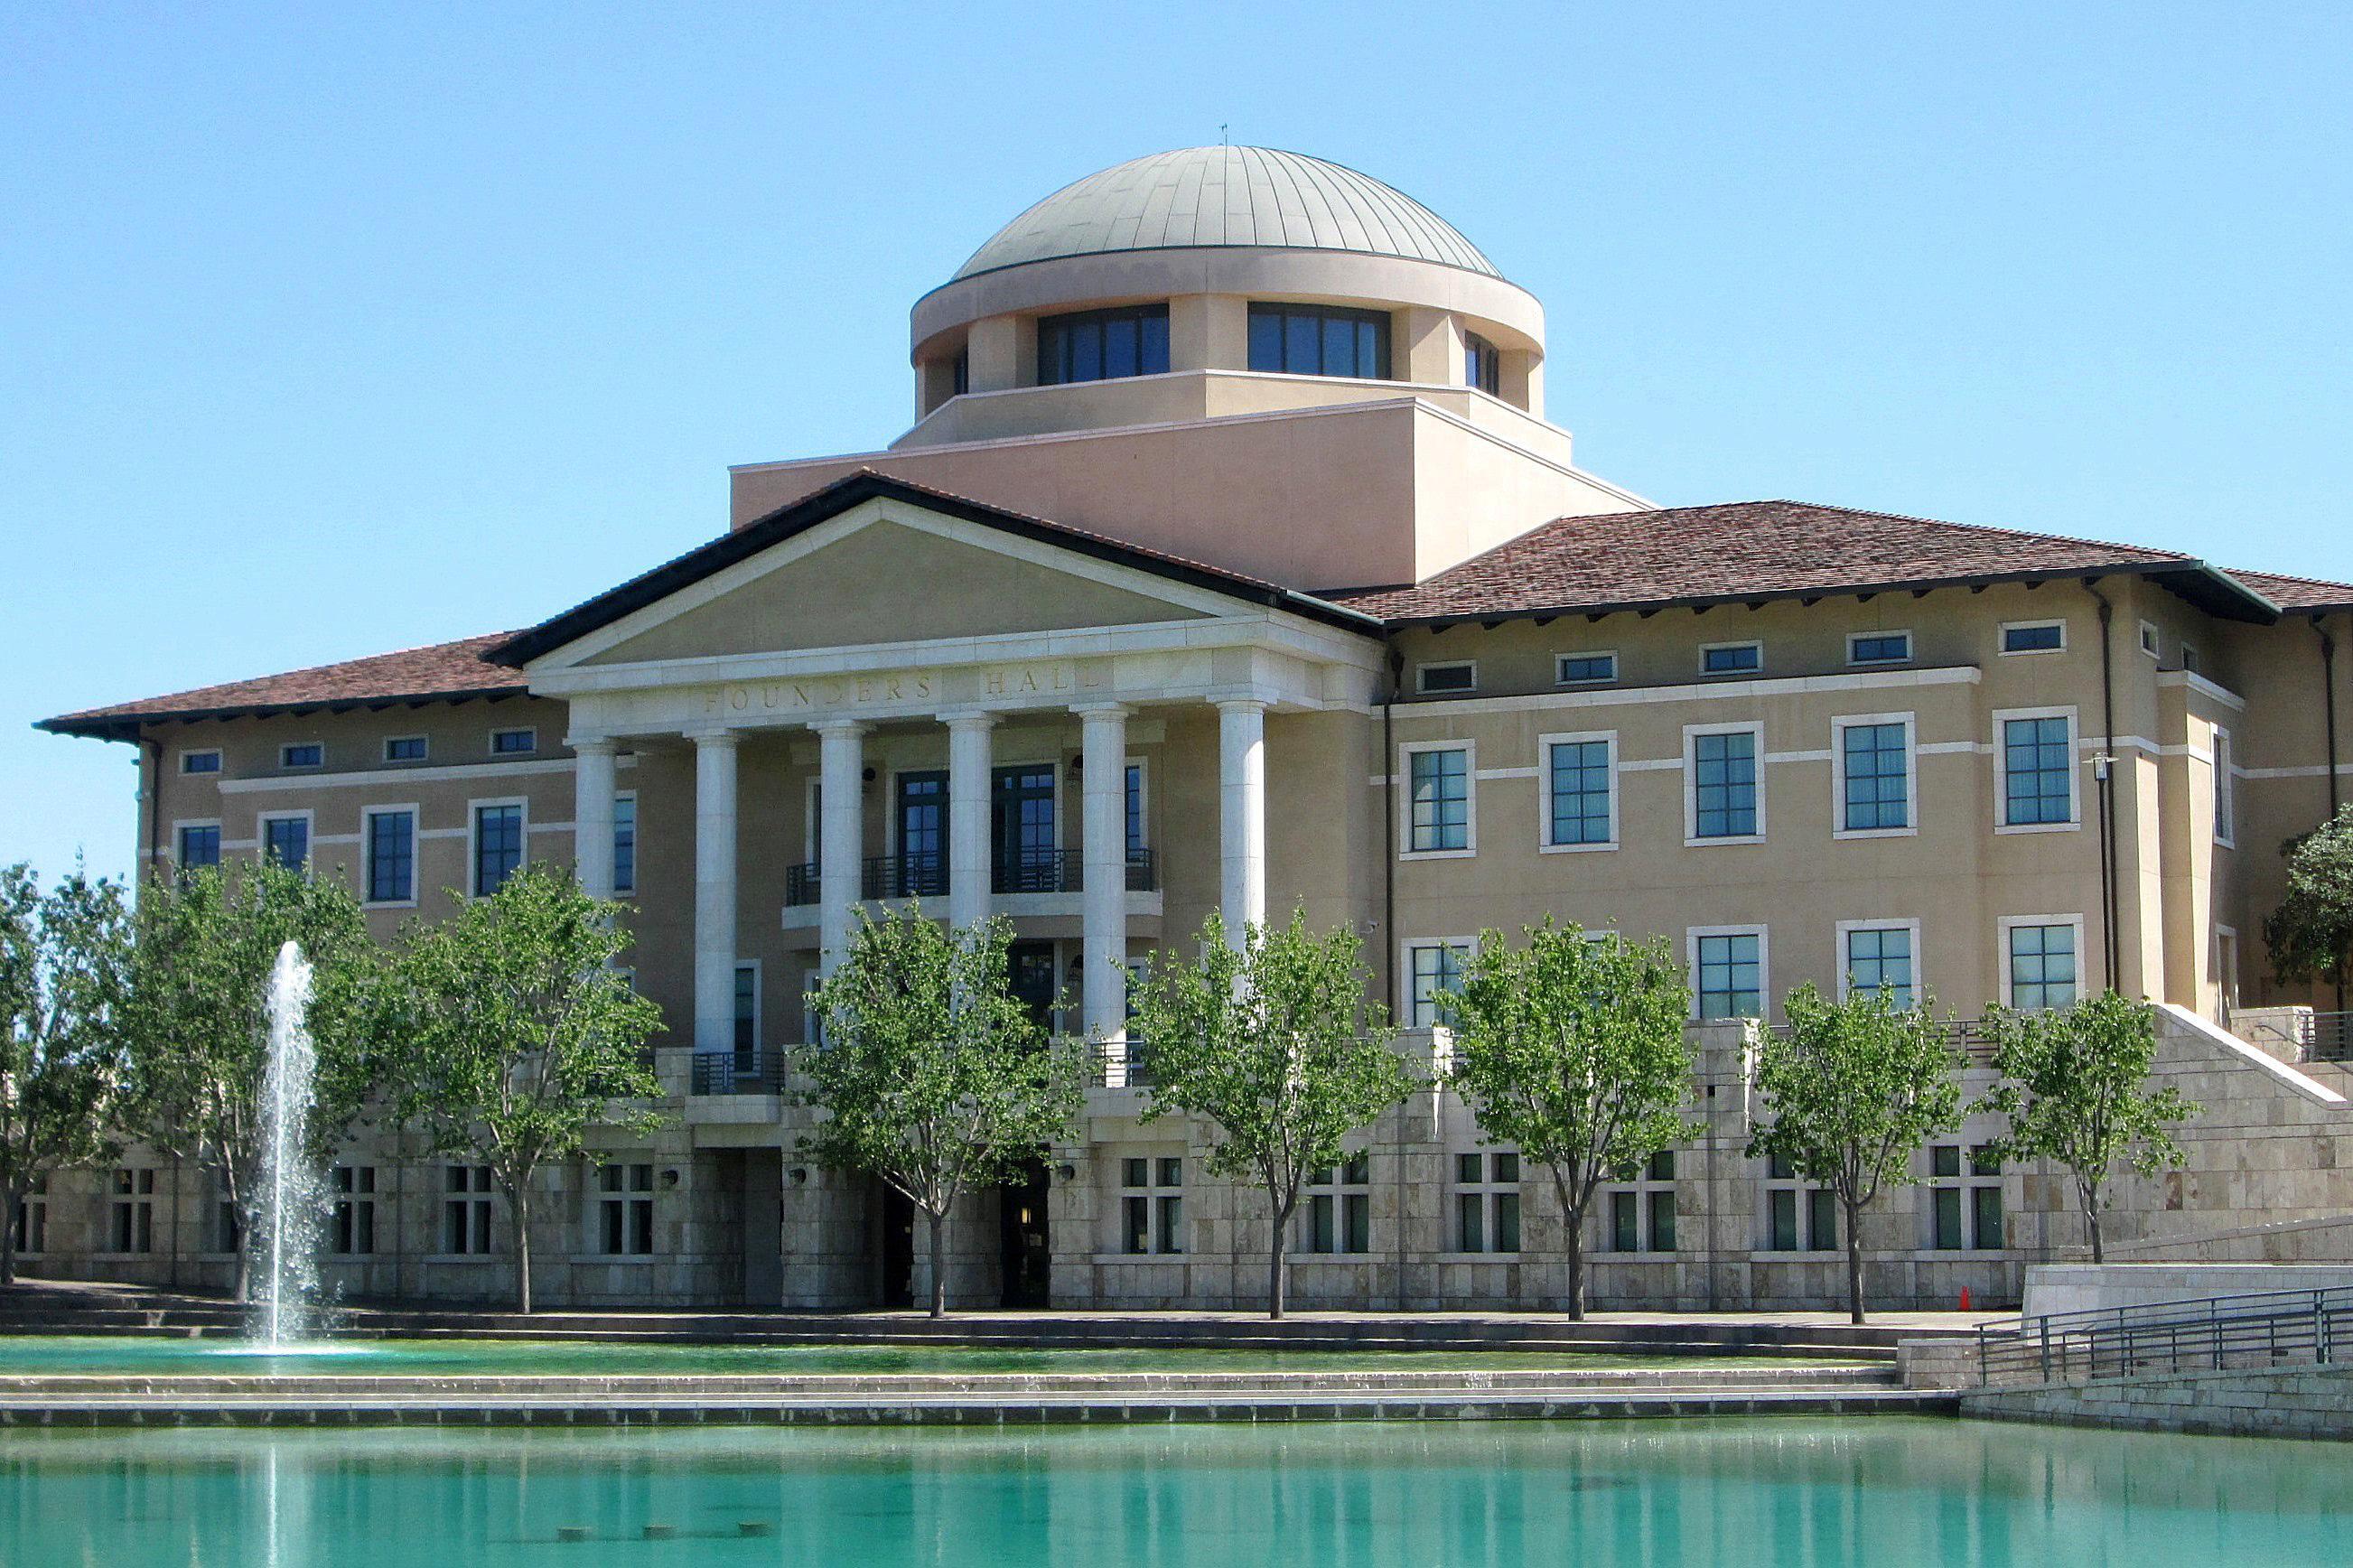 Founders Hall at Soka University of America